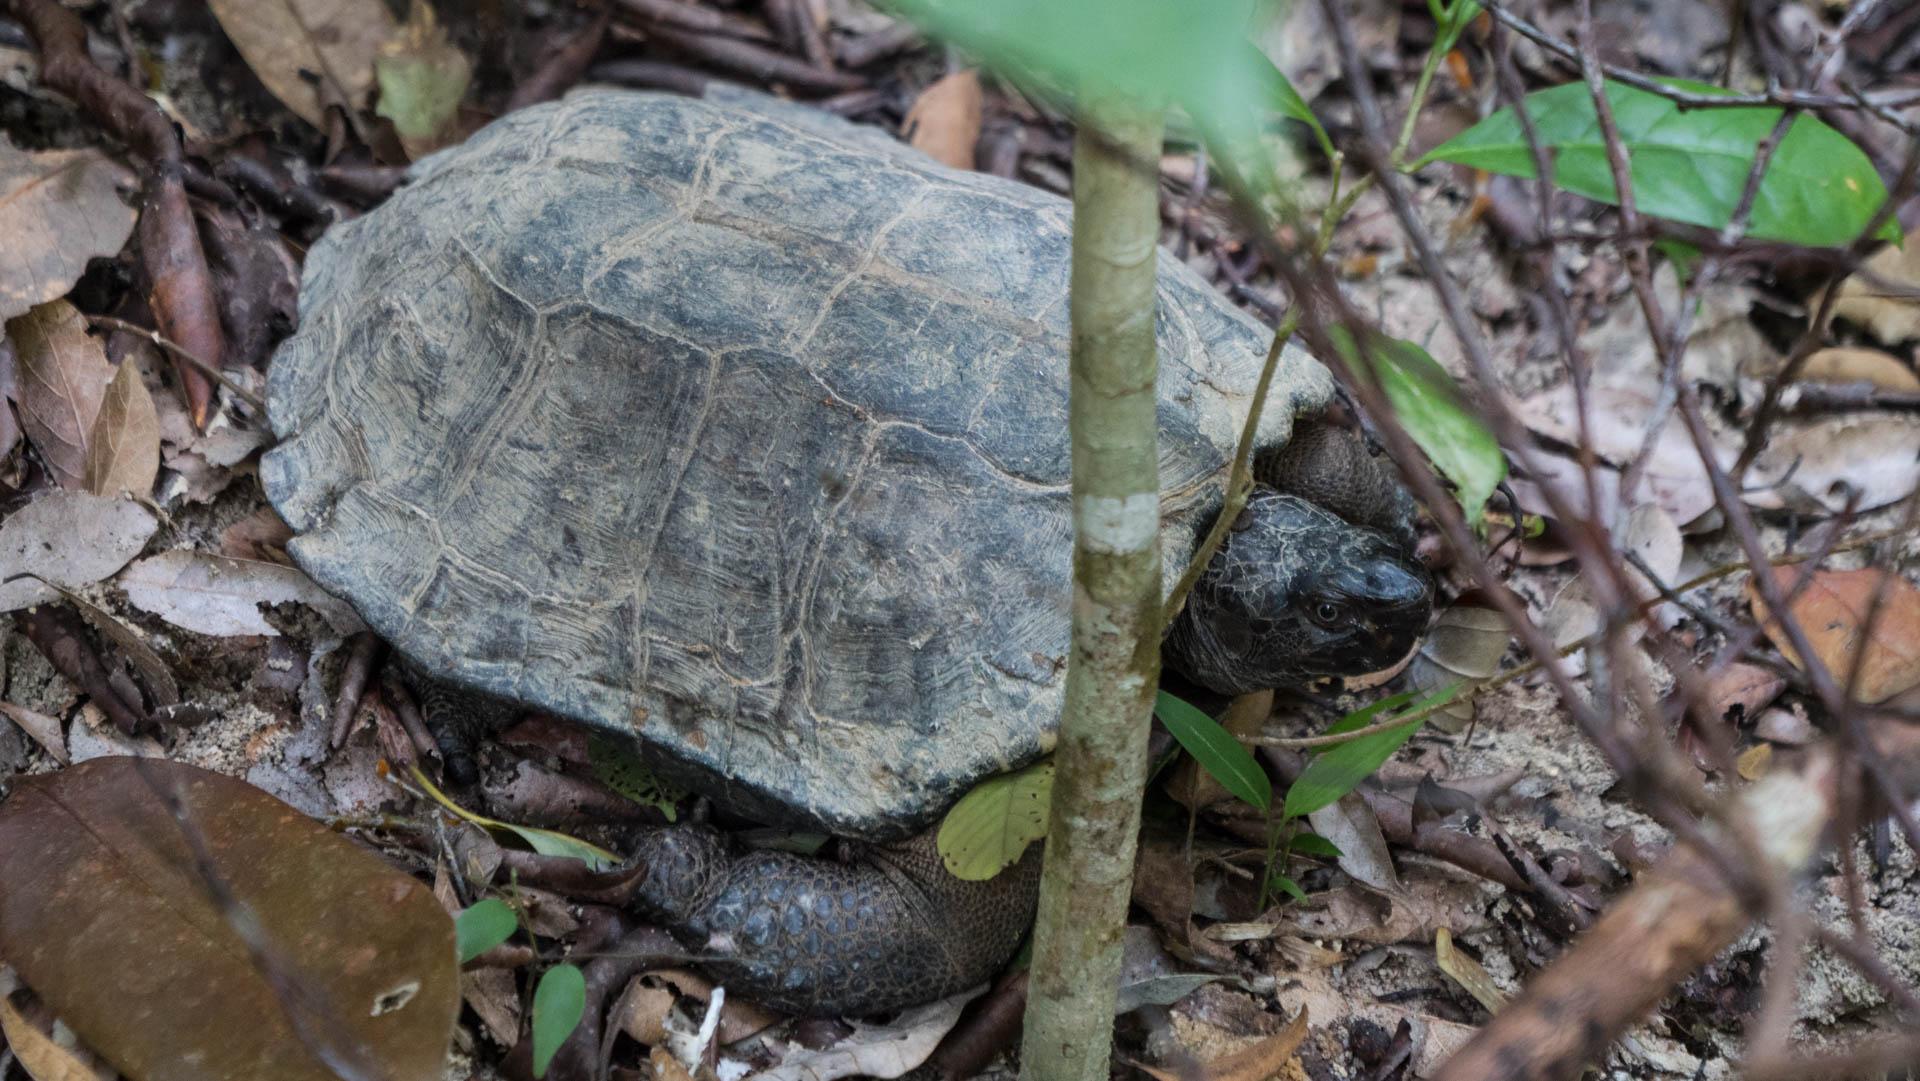 Penang tortue - Les globe blogueurs - blog voyage nature